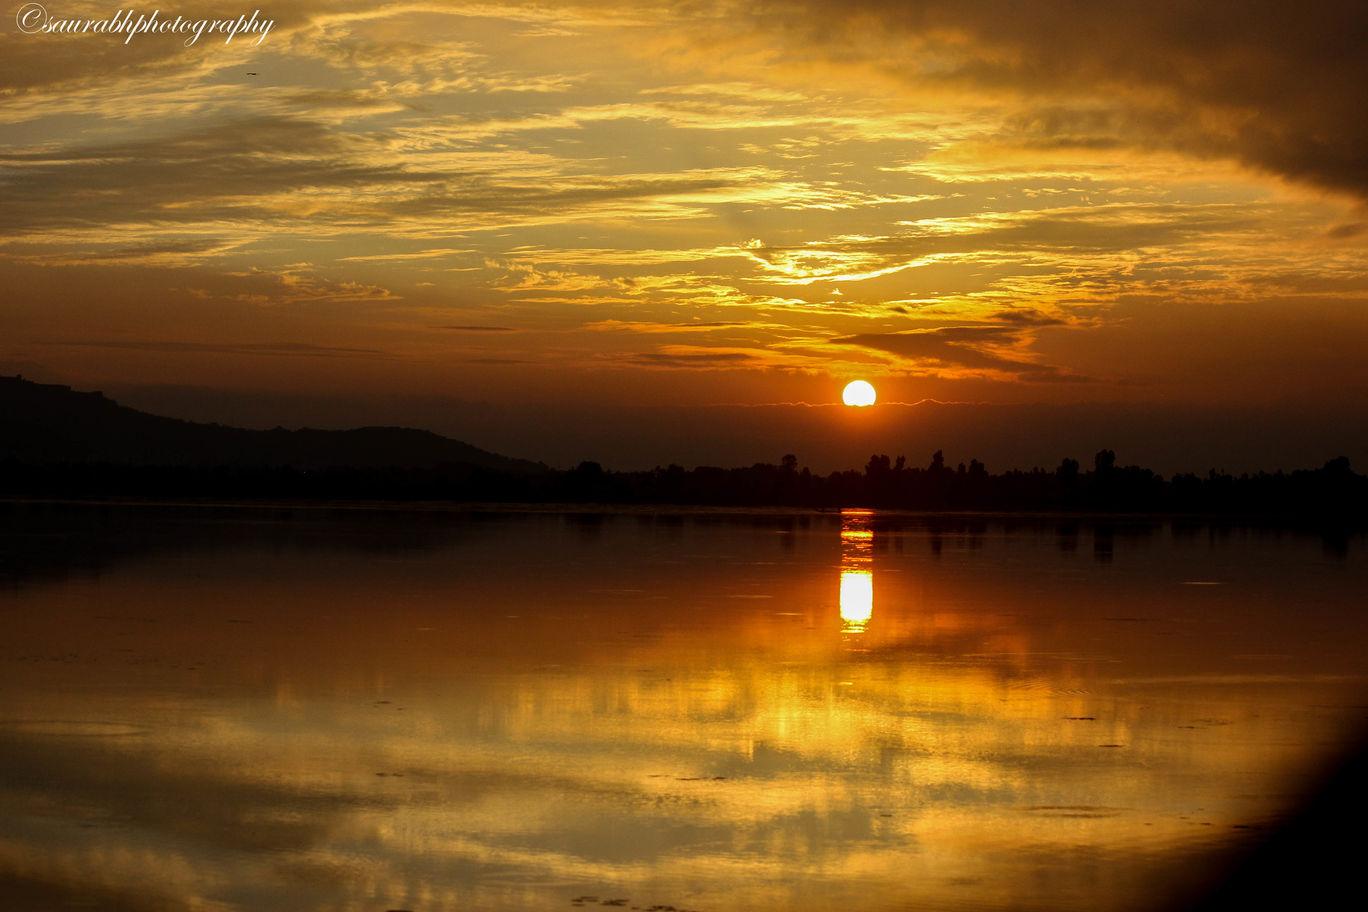 Photo of Dal Lake By Saurabh Walekar